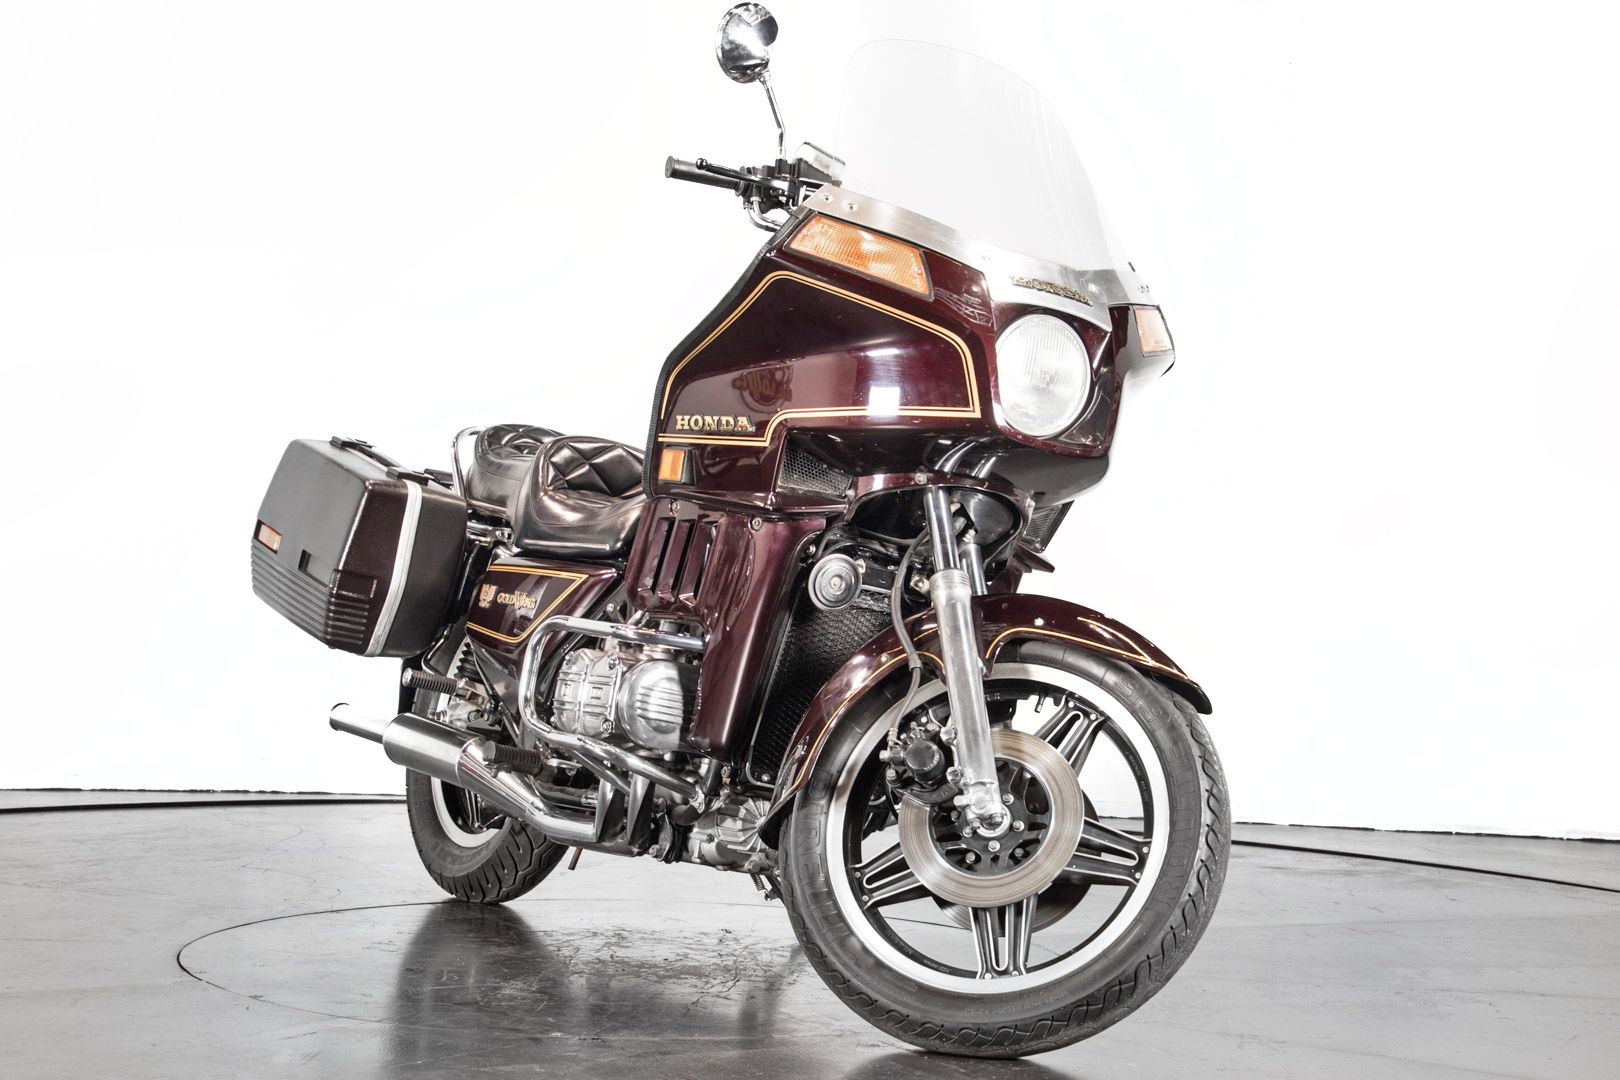 1982 Honda Gold Wing GL 1100 38916